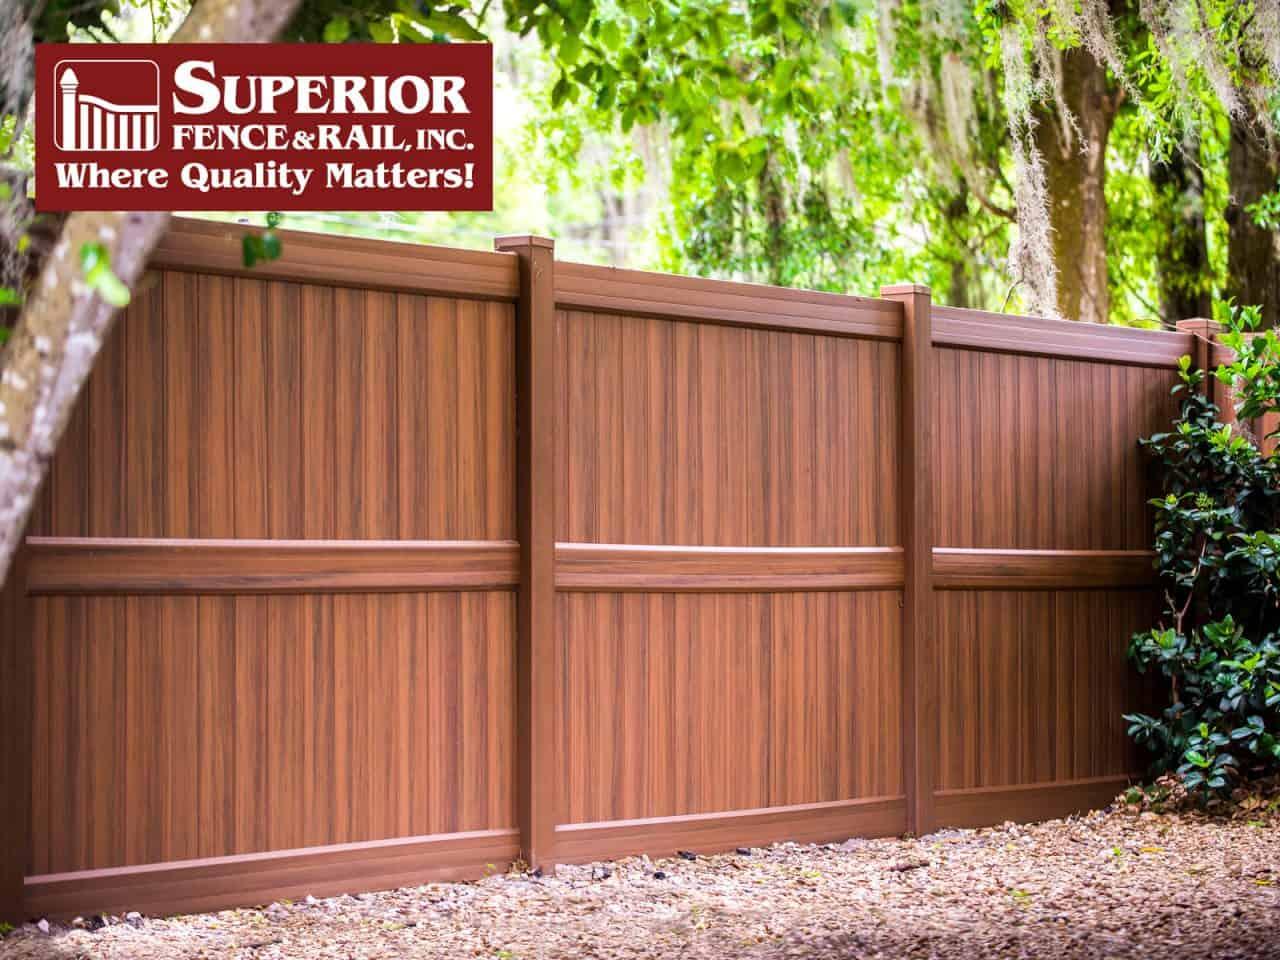 https://www.superiorfenceandrail.com/wp-content/uploads/2020/01/Murfreesboro-TN-fence-company-1280x960.jpg